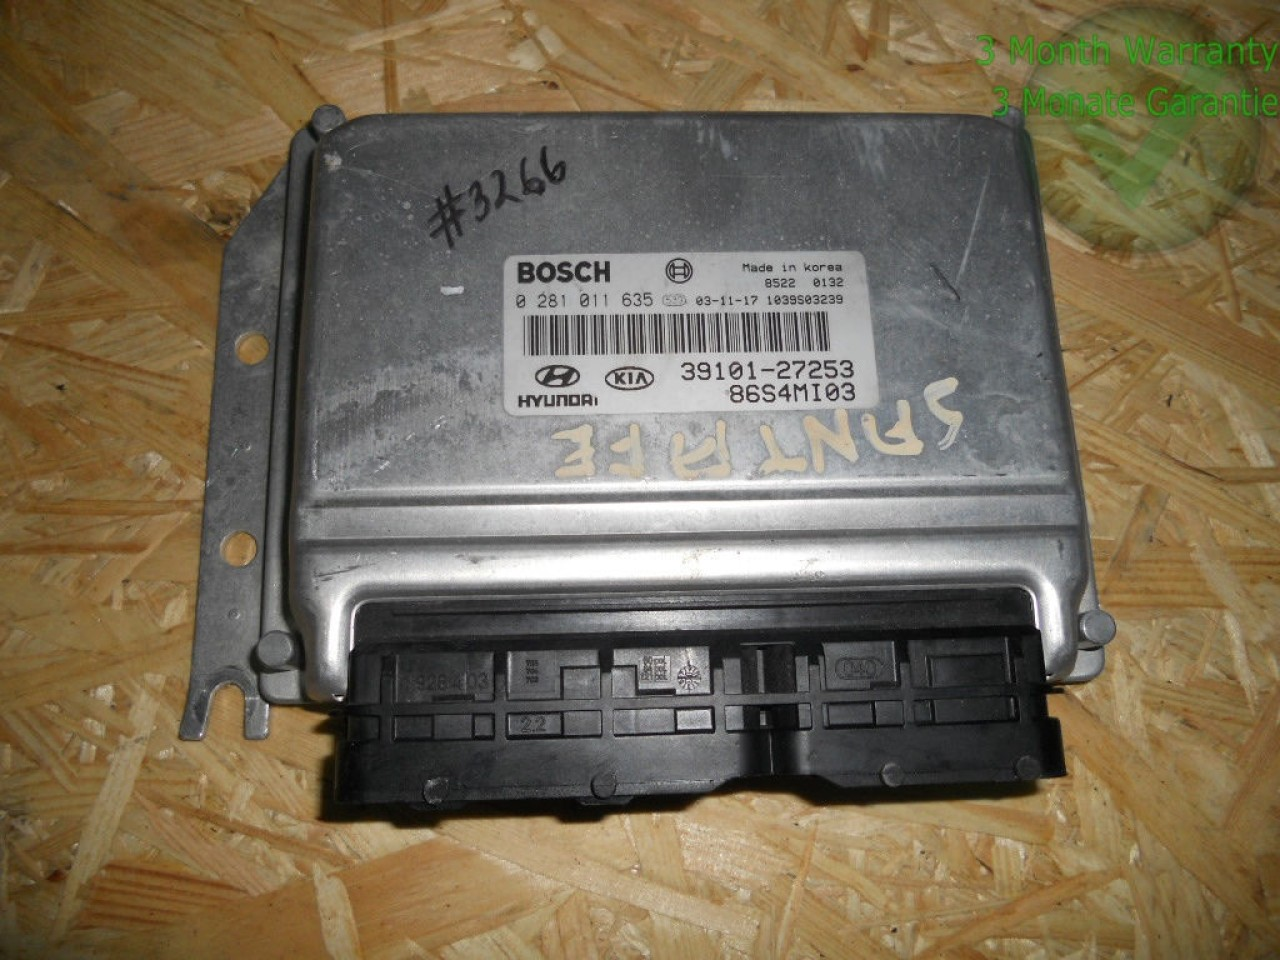 Calculator motor(ecu) hyundai sante fe 2.0 crdi cod 39101-27253 0281011635